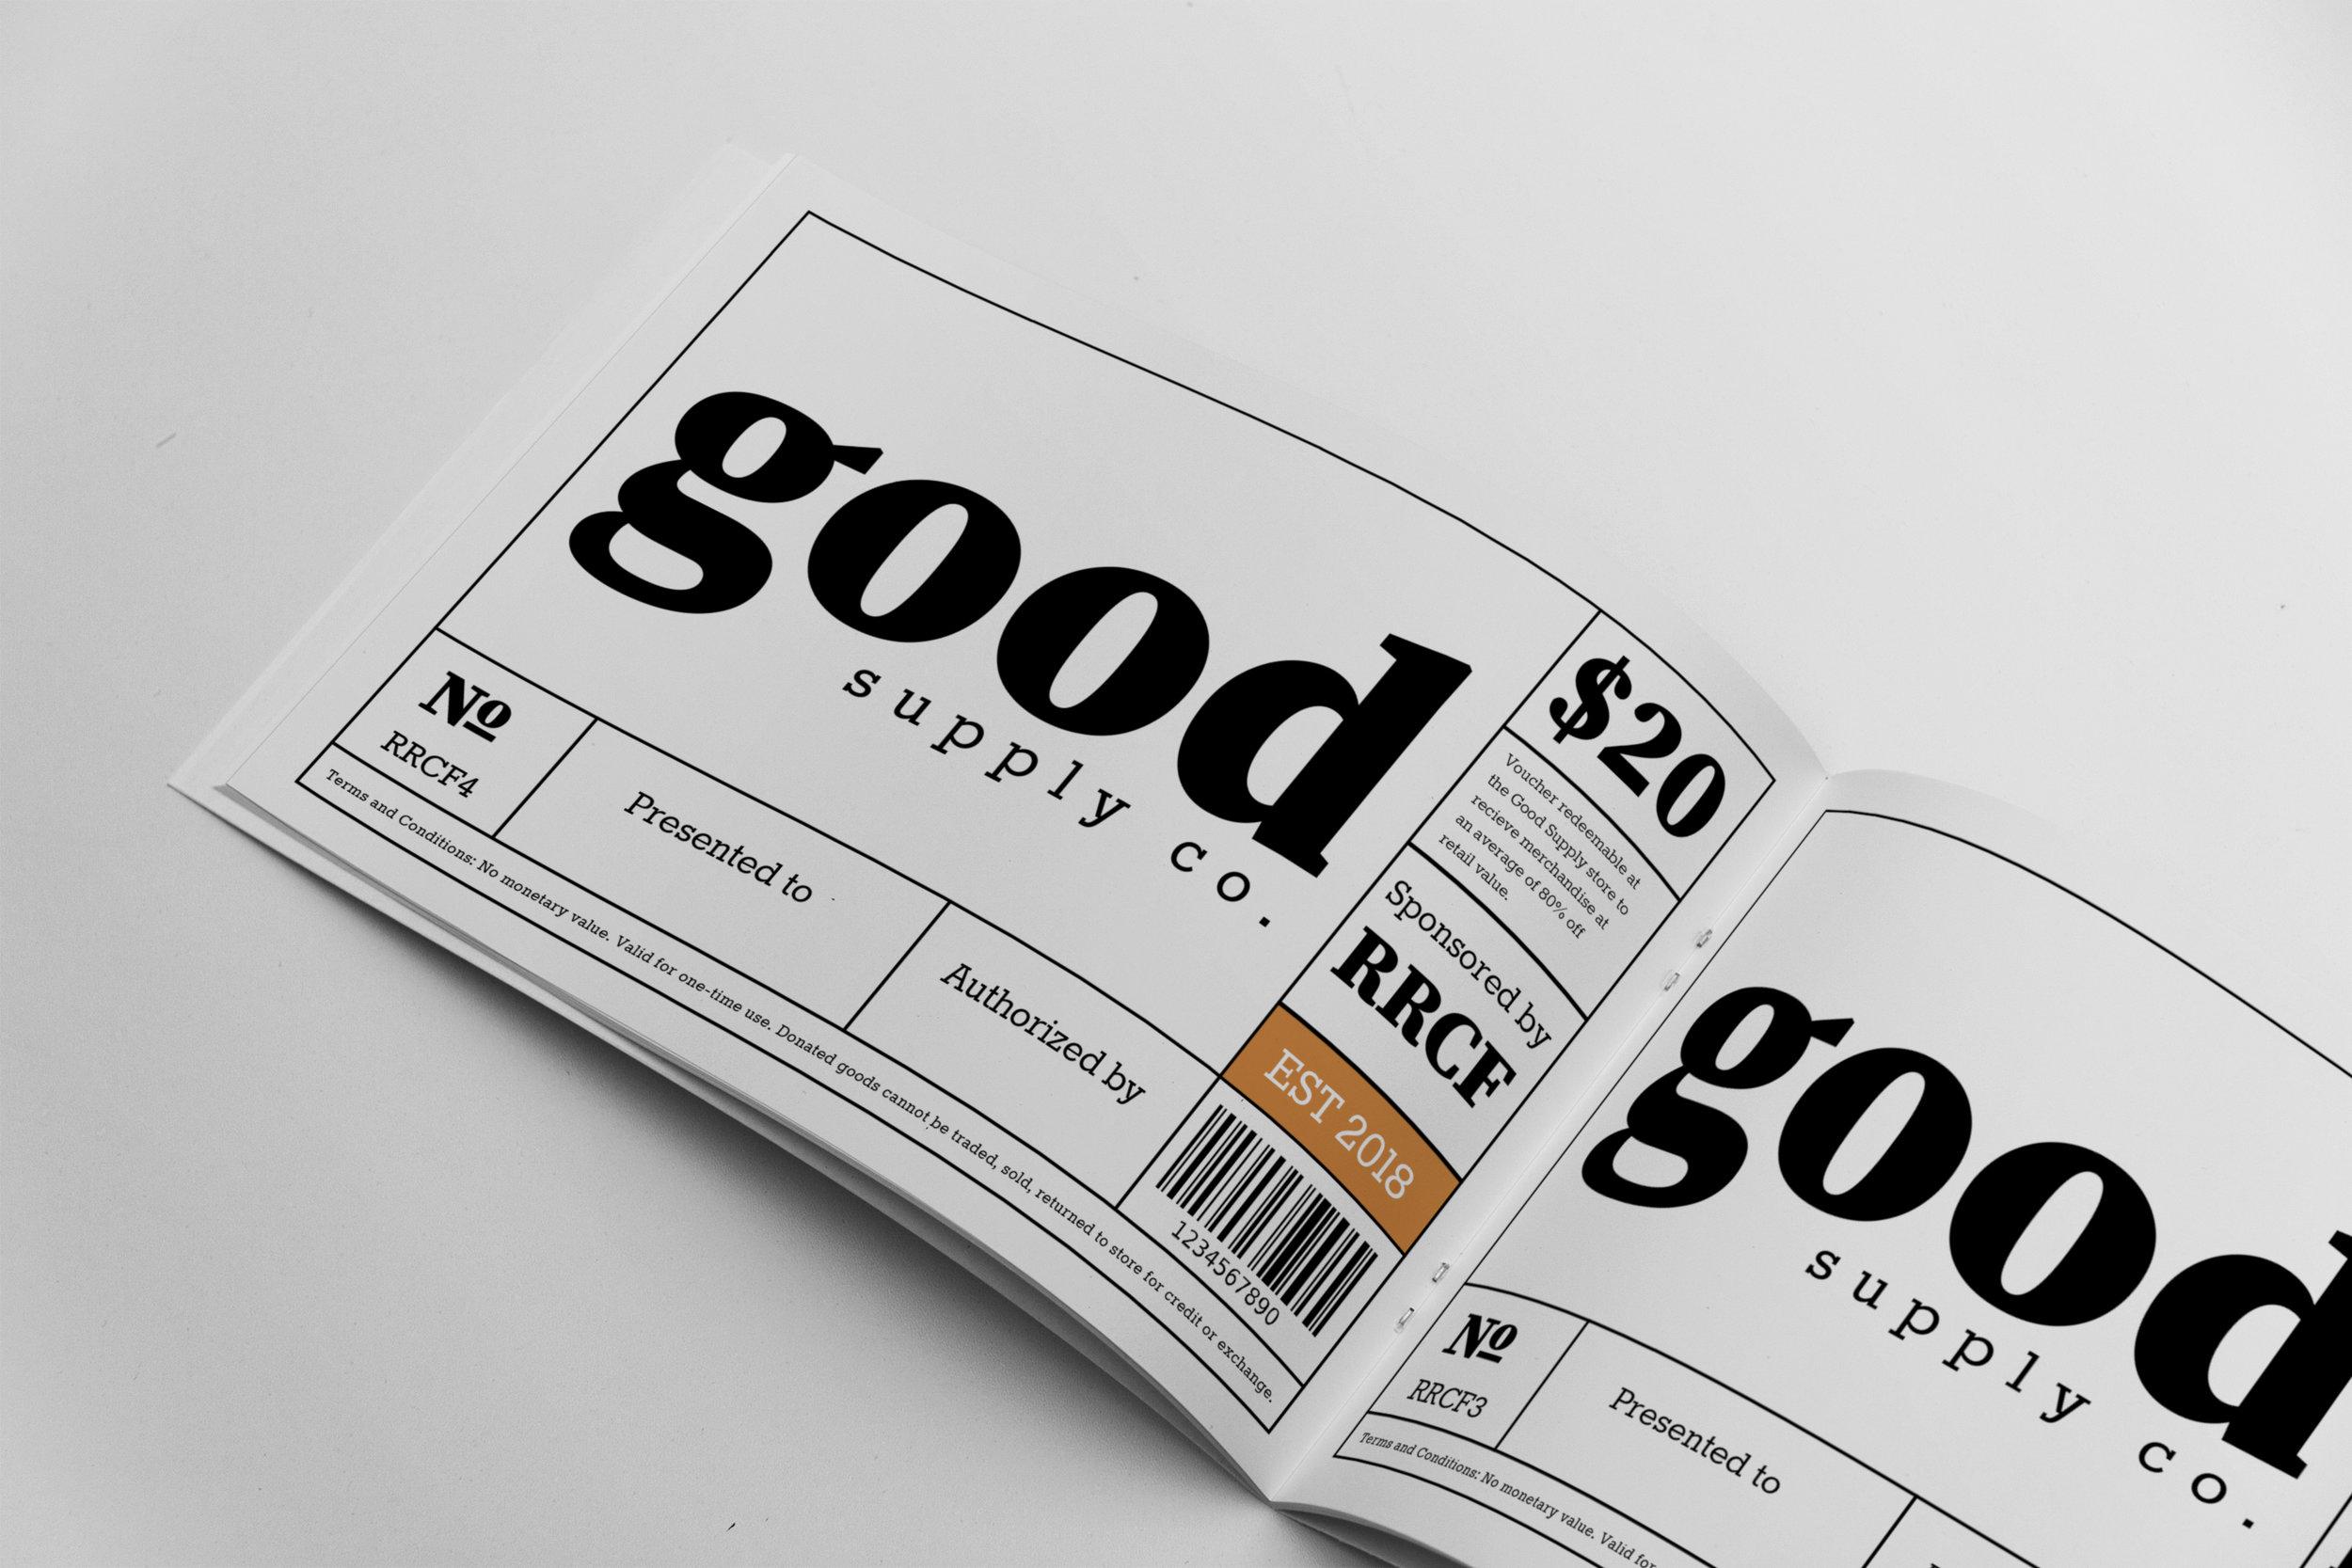 good-supply-co-reno-vouchers.jpg